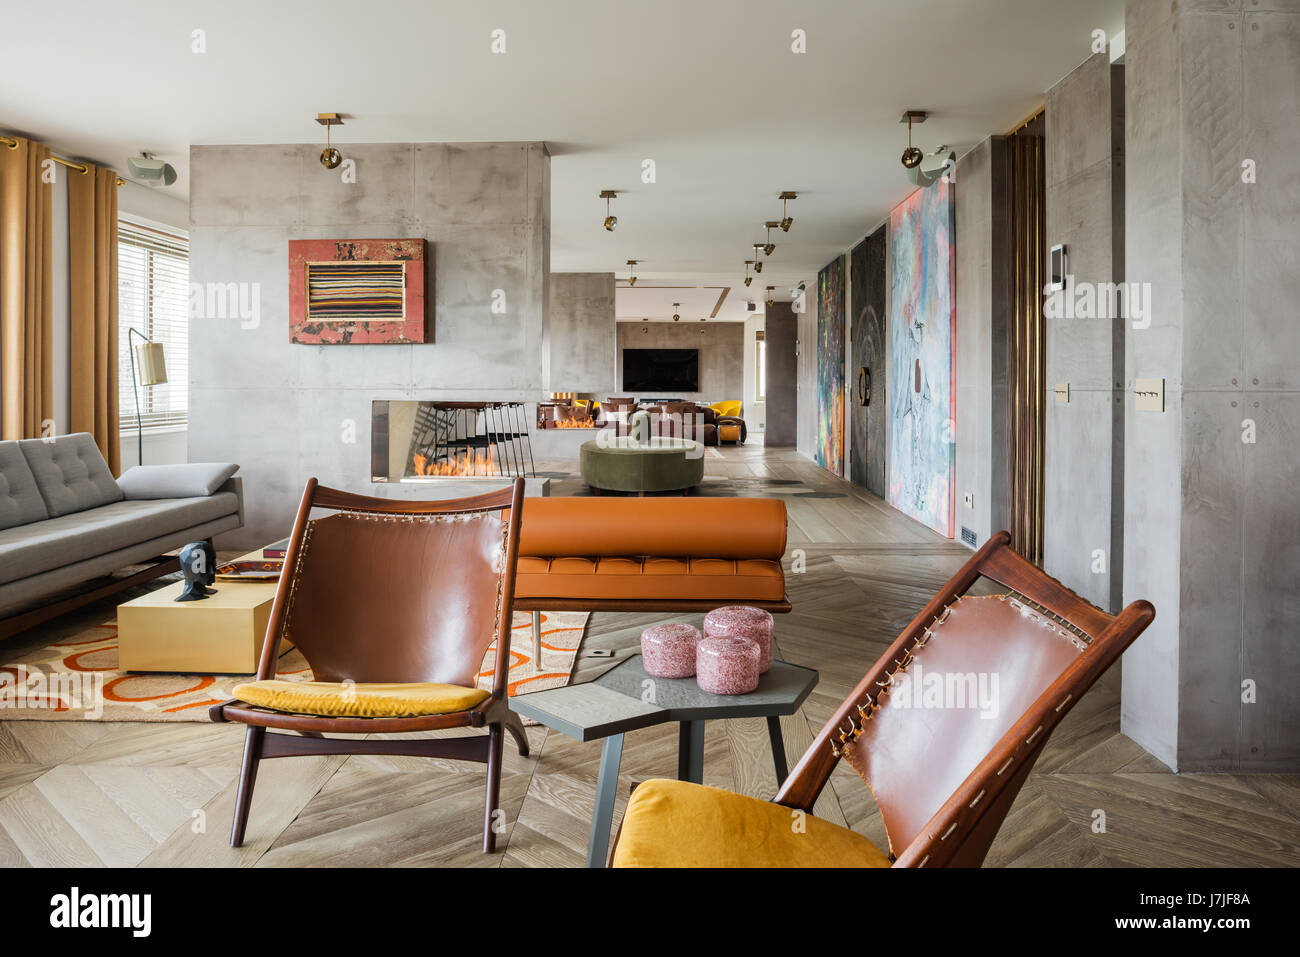 Pair of brown leather, vintage Sadler chairs in 30 meter open plan living space - Stock Image